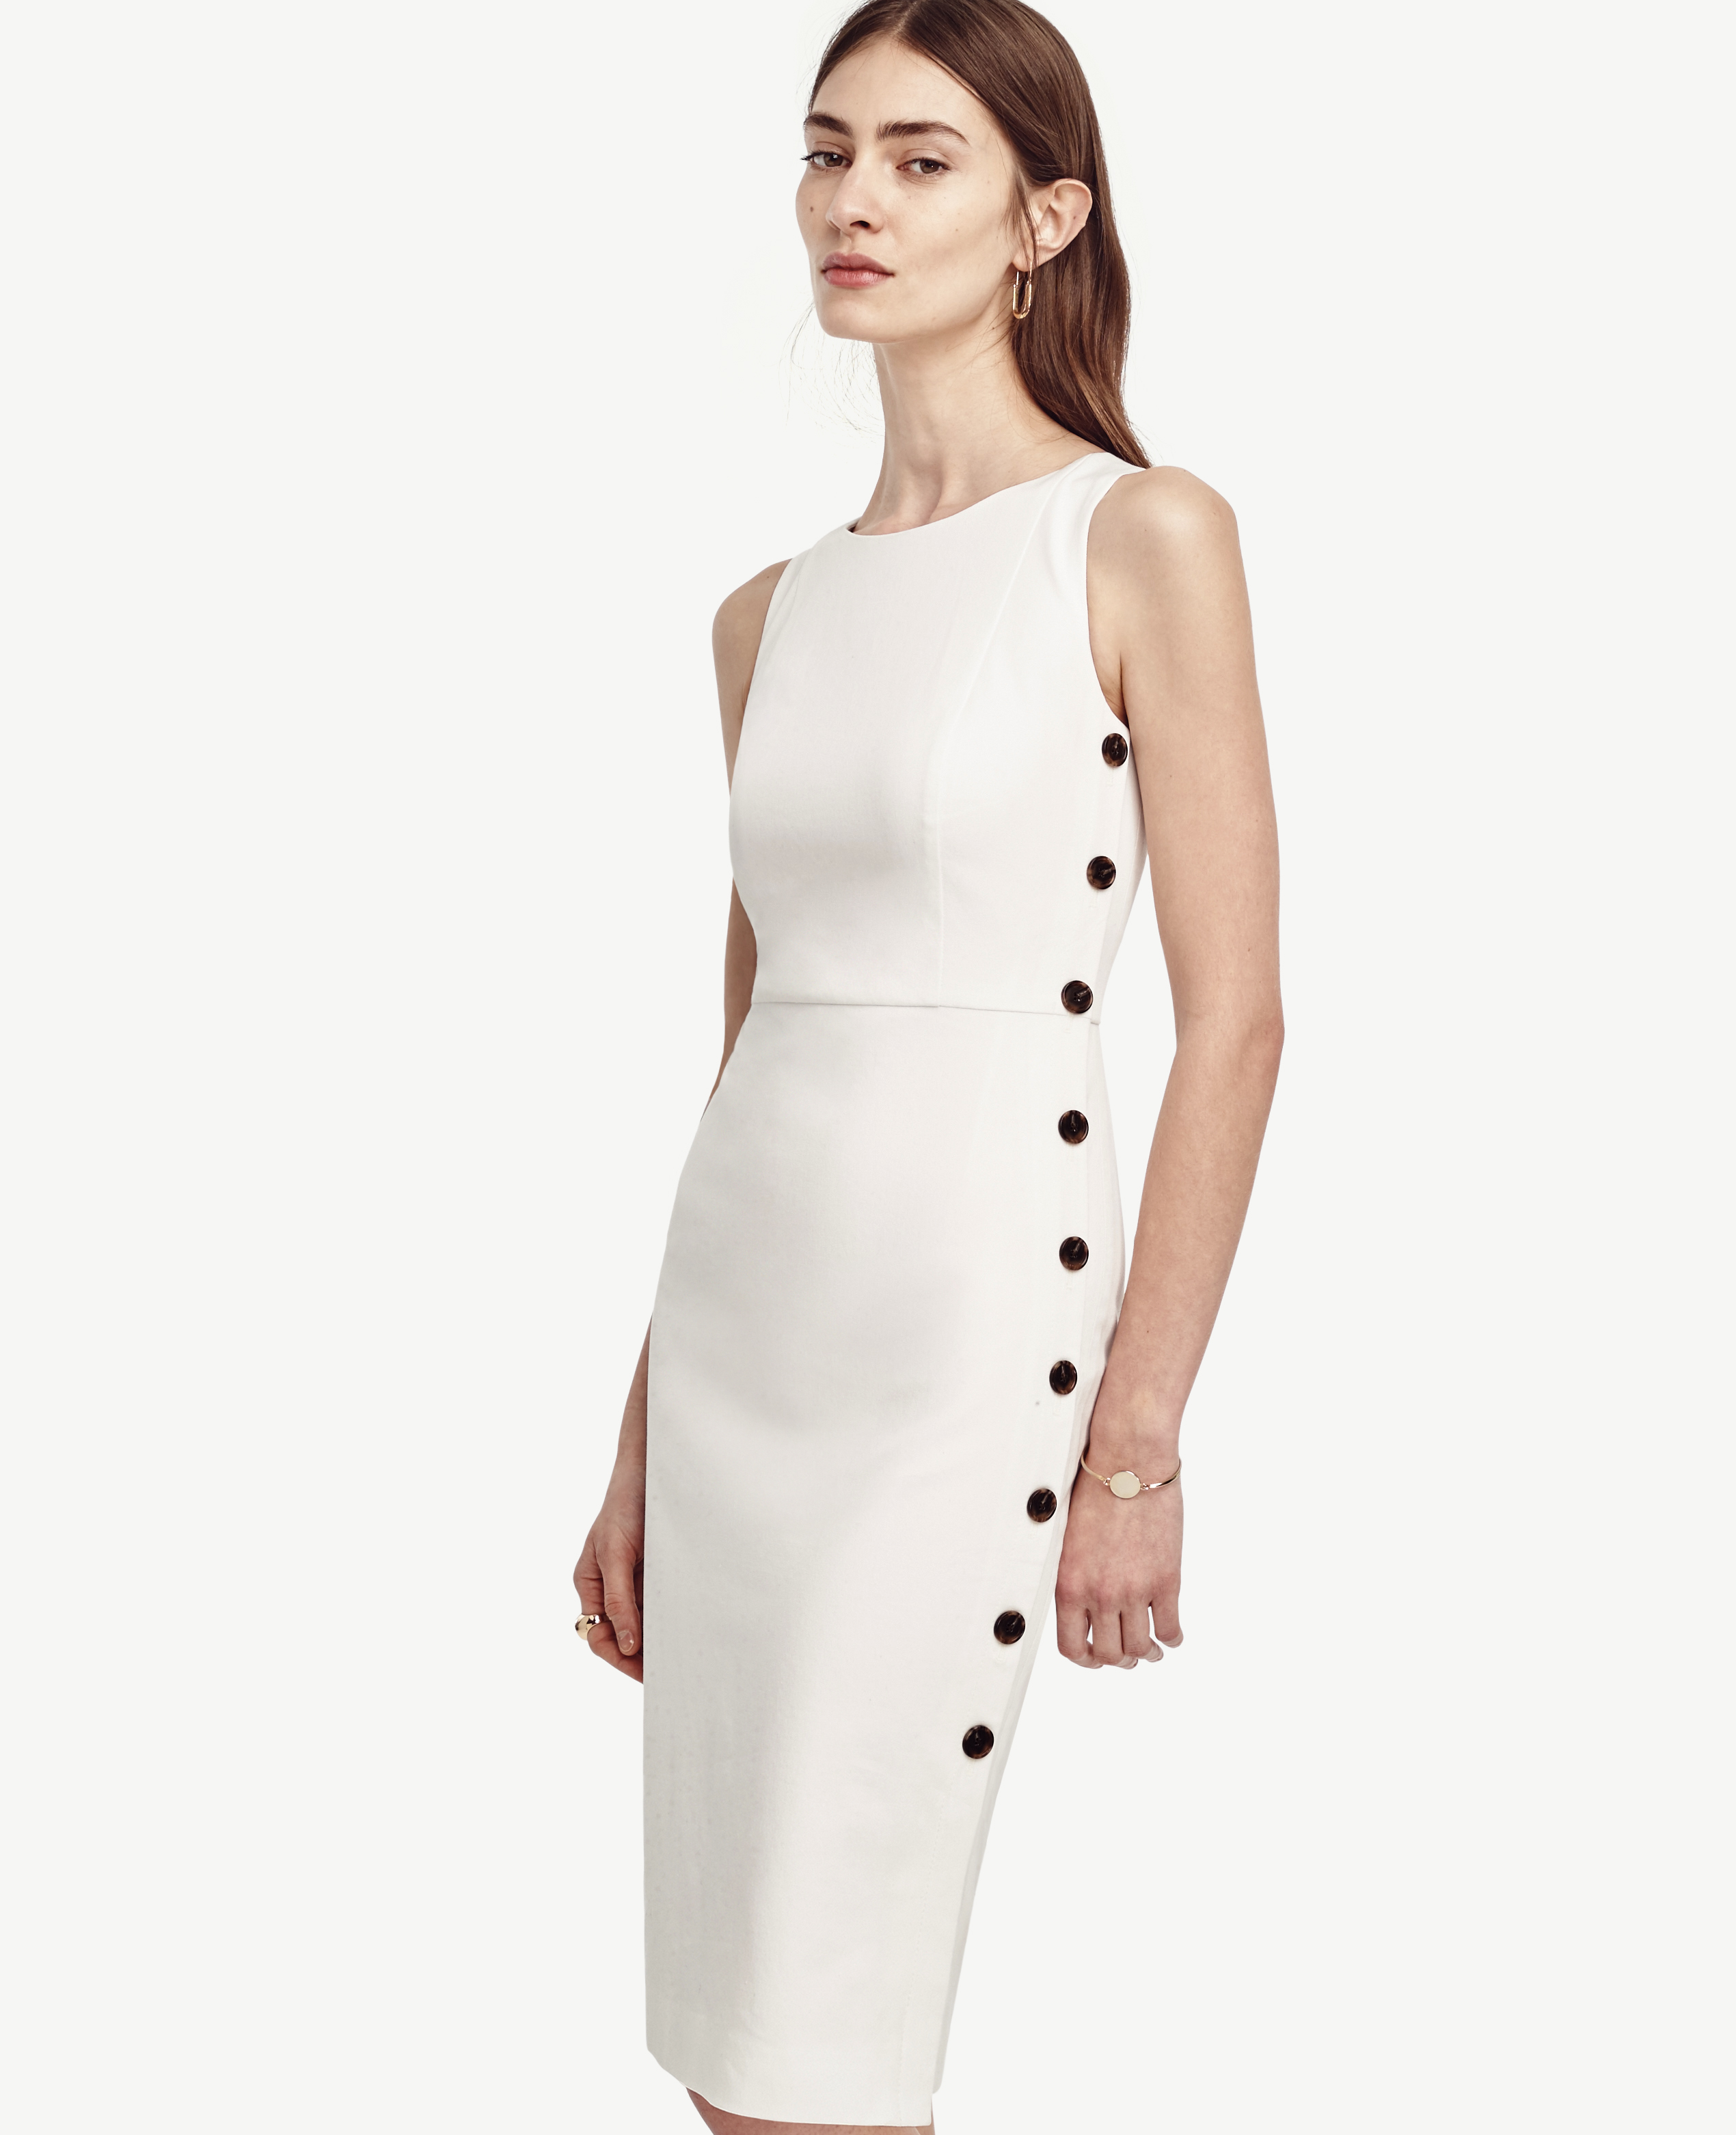 Ann Taylor Petite Side Button Dress In White Lyst